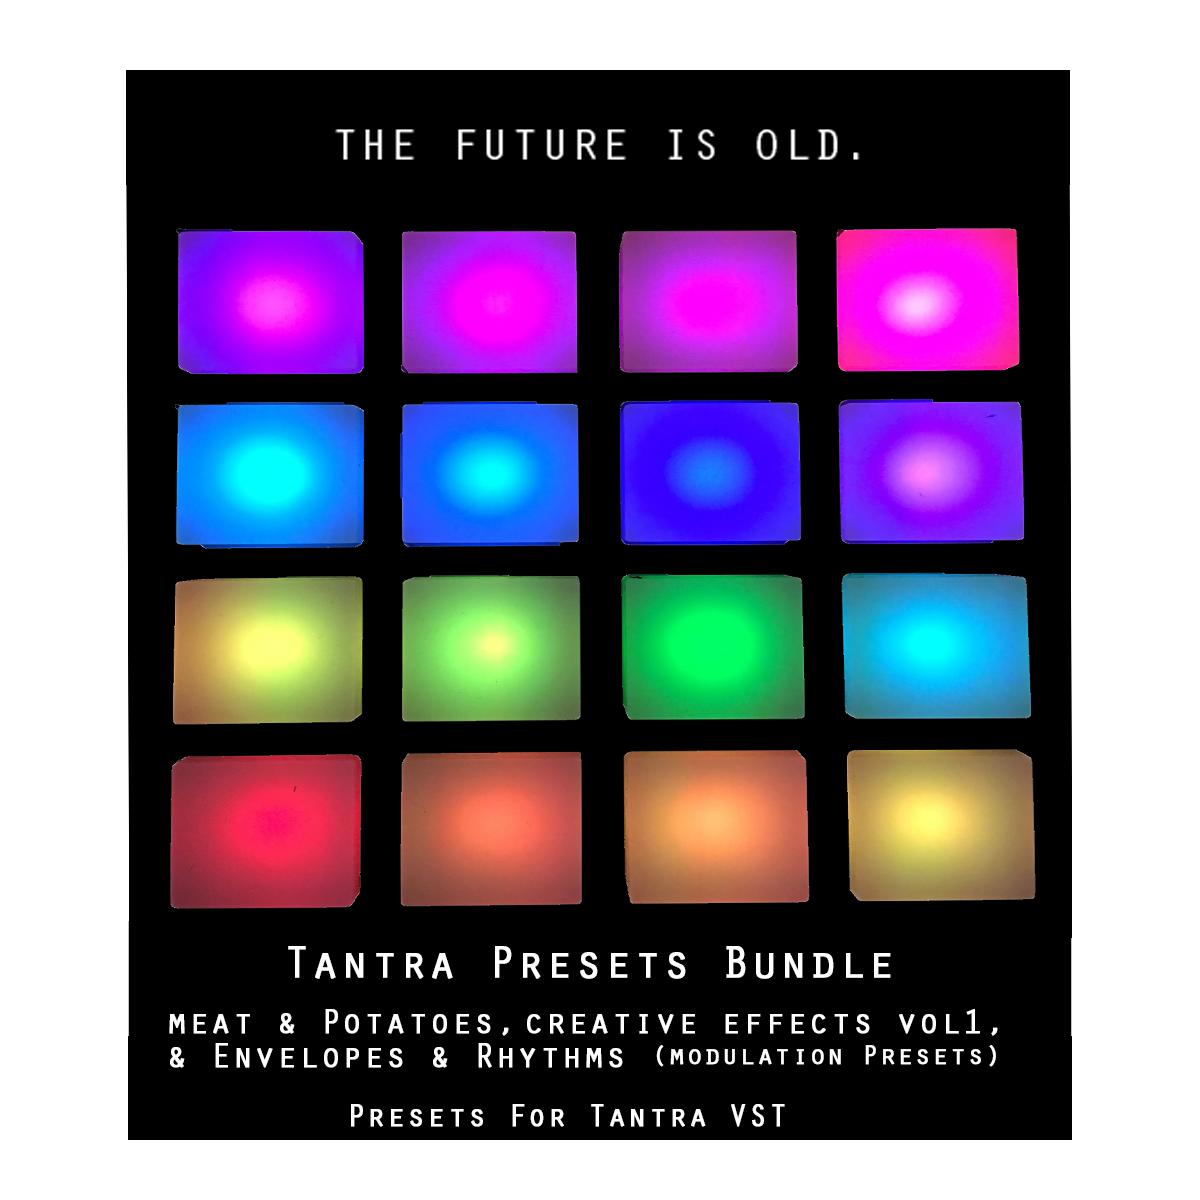 Tantra Presets Bundle For Tantra VST Demo by thefutureisold